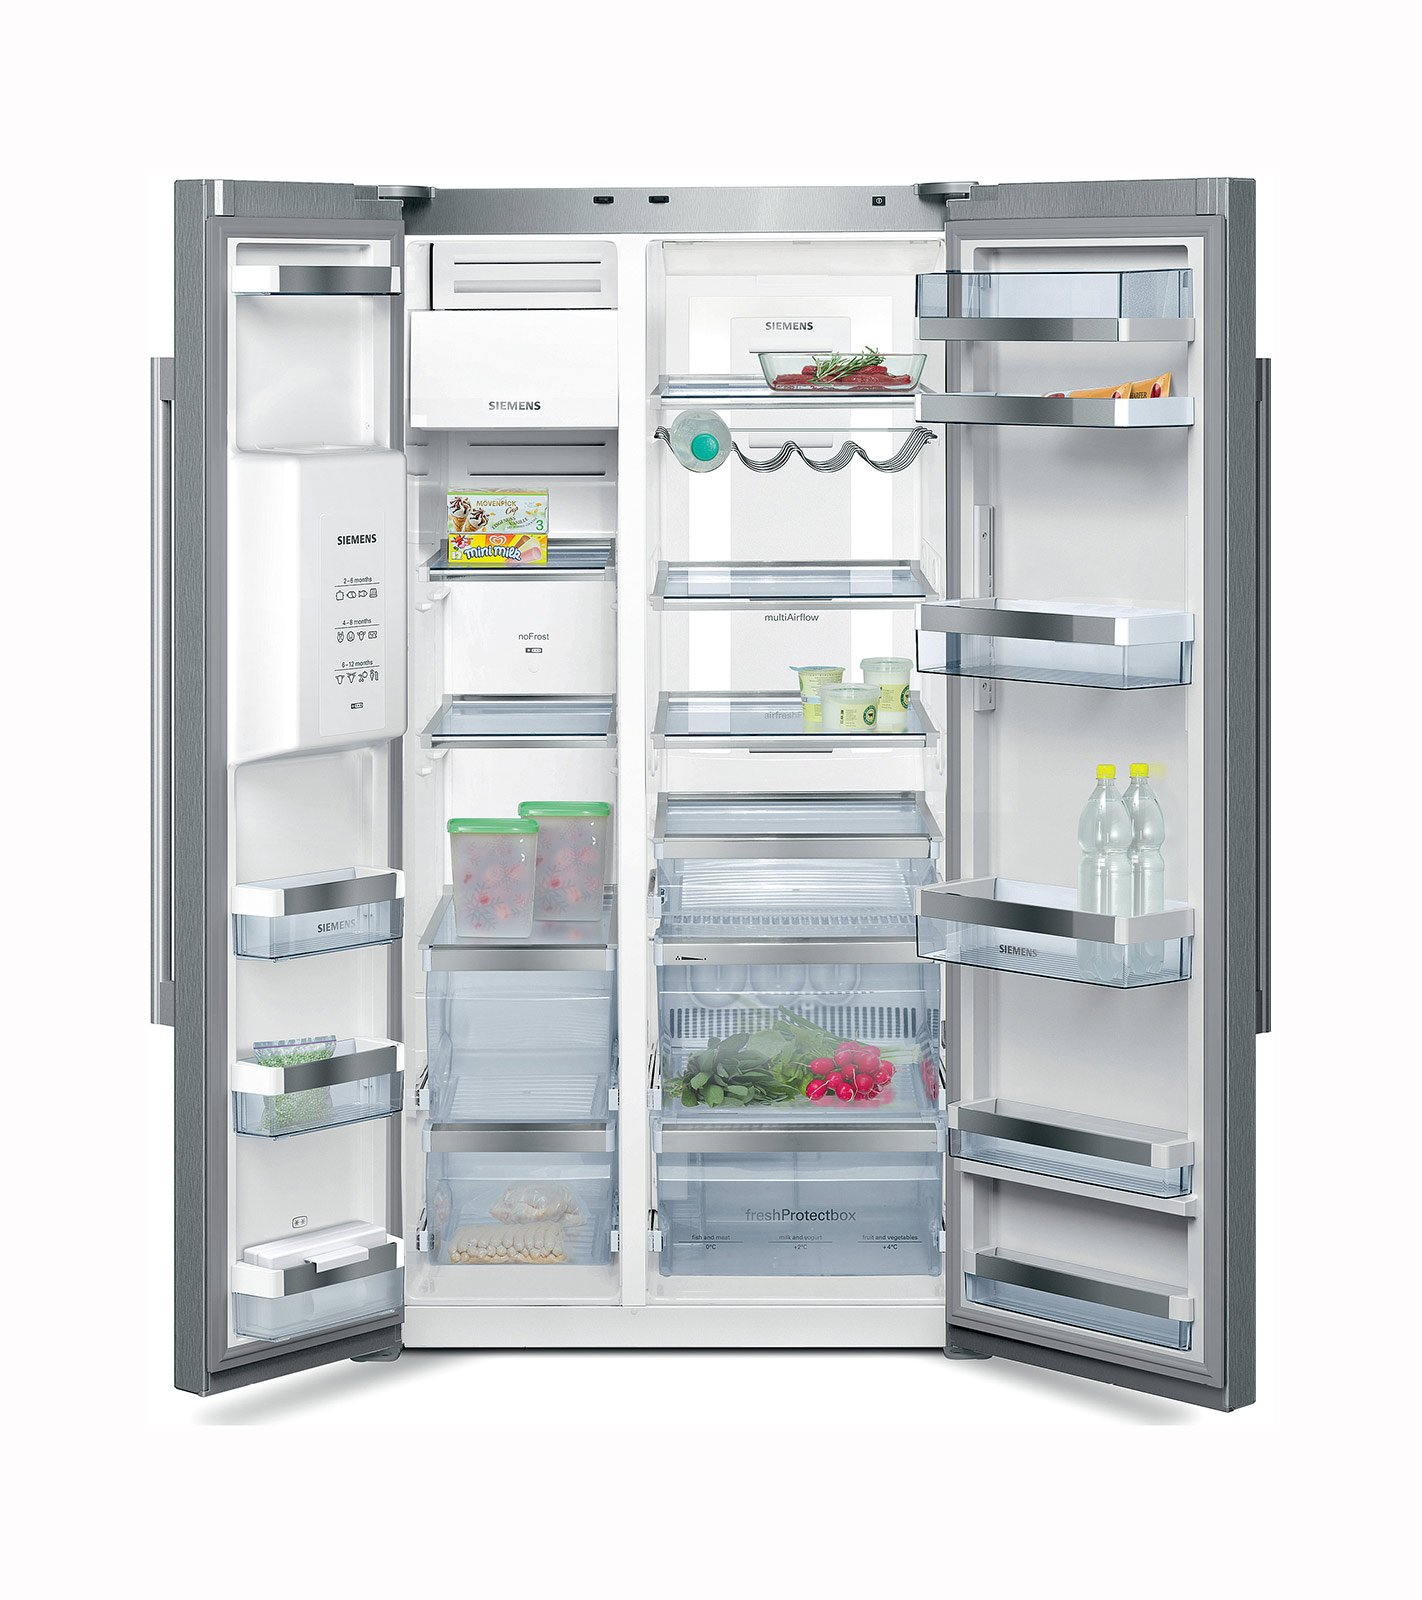 Frigo e congelatore modelli maxi a tre porte side by side cose di casa - Temperatura frigo casa ...